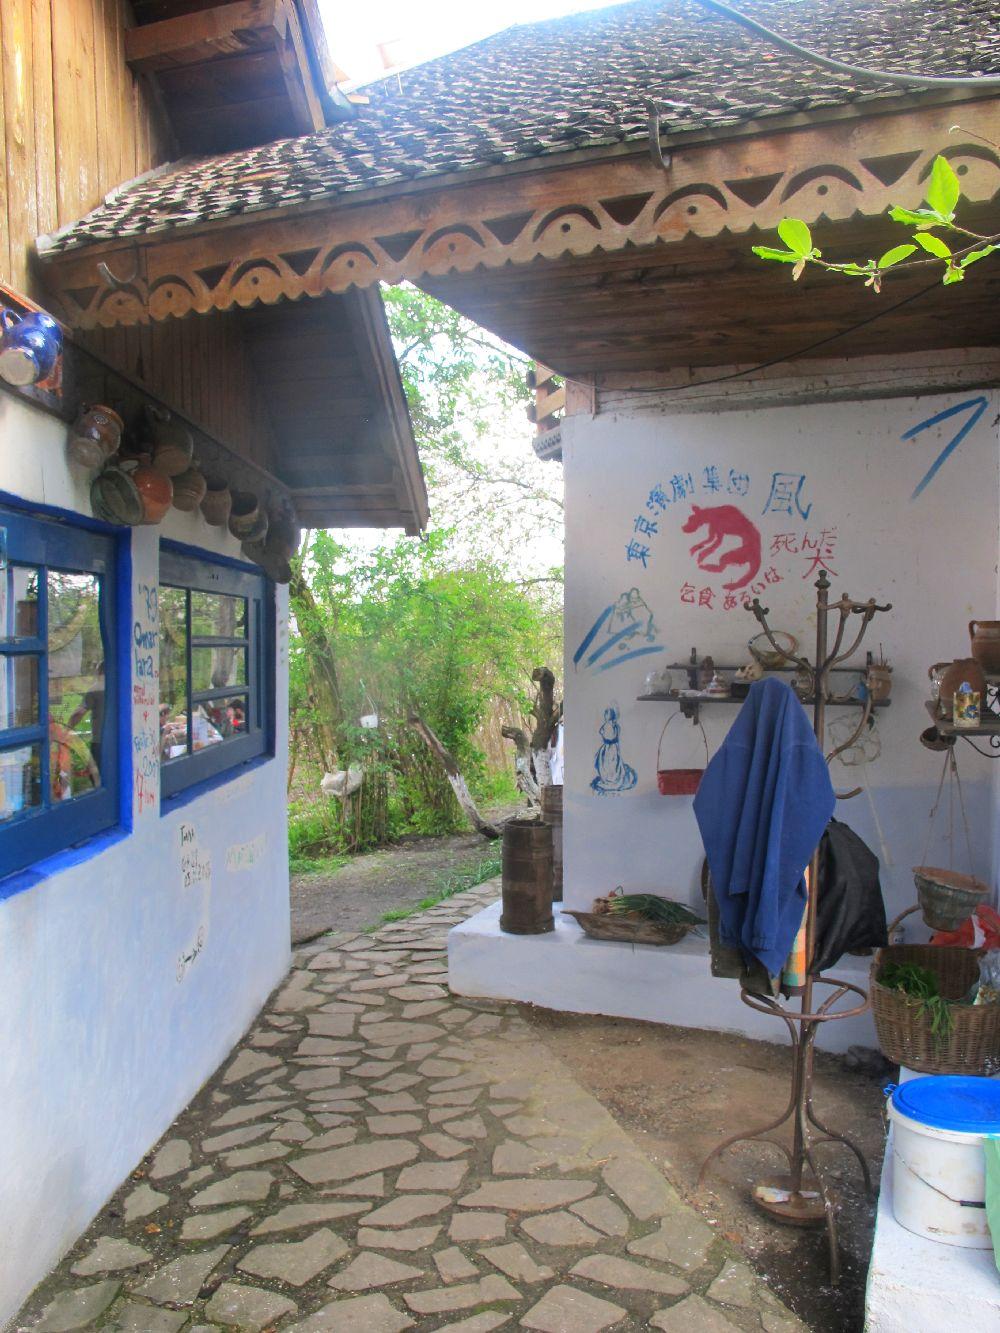 adelaparvu.com despre casa Ioanei Craciunescu, casa taraneasca romaneasca (57)